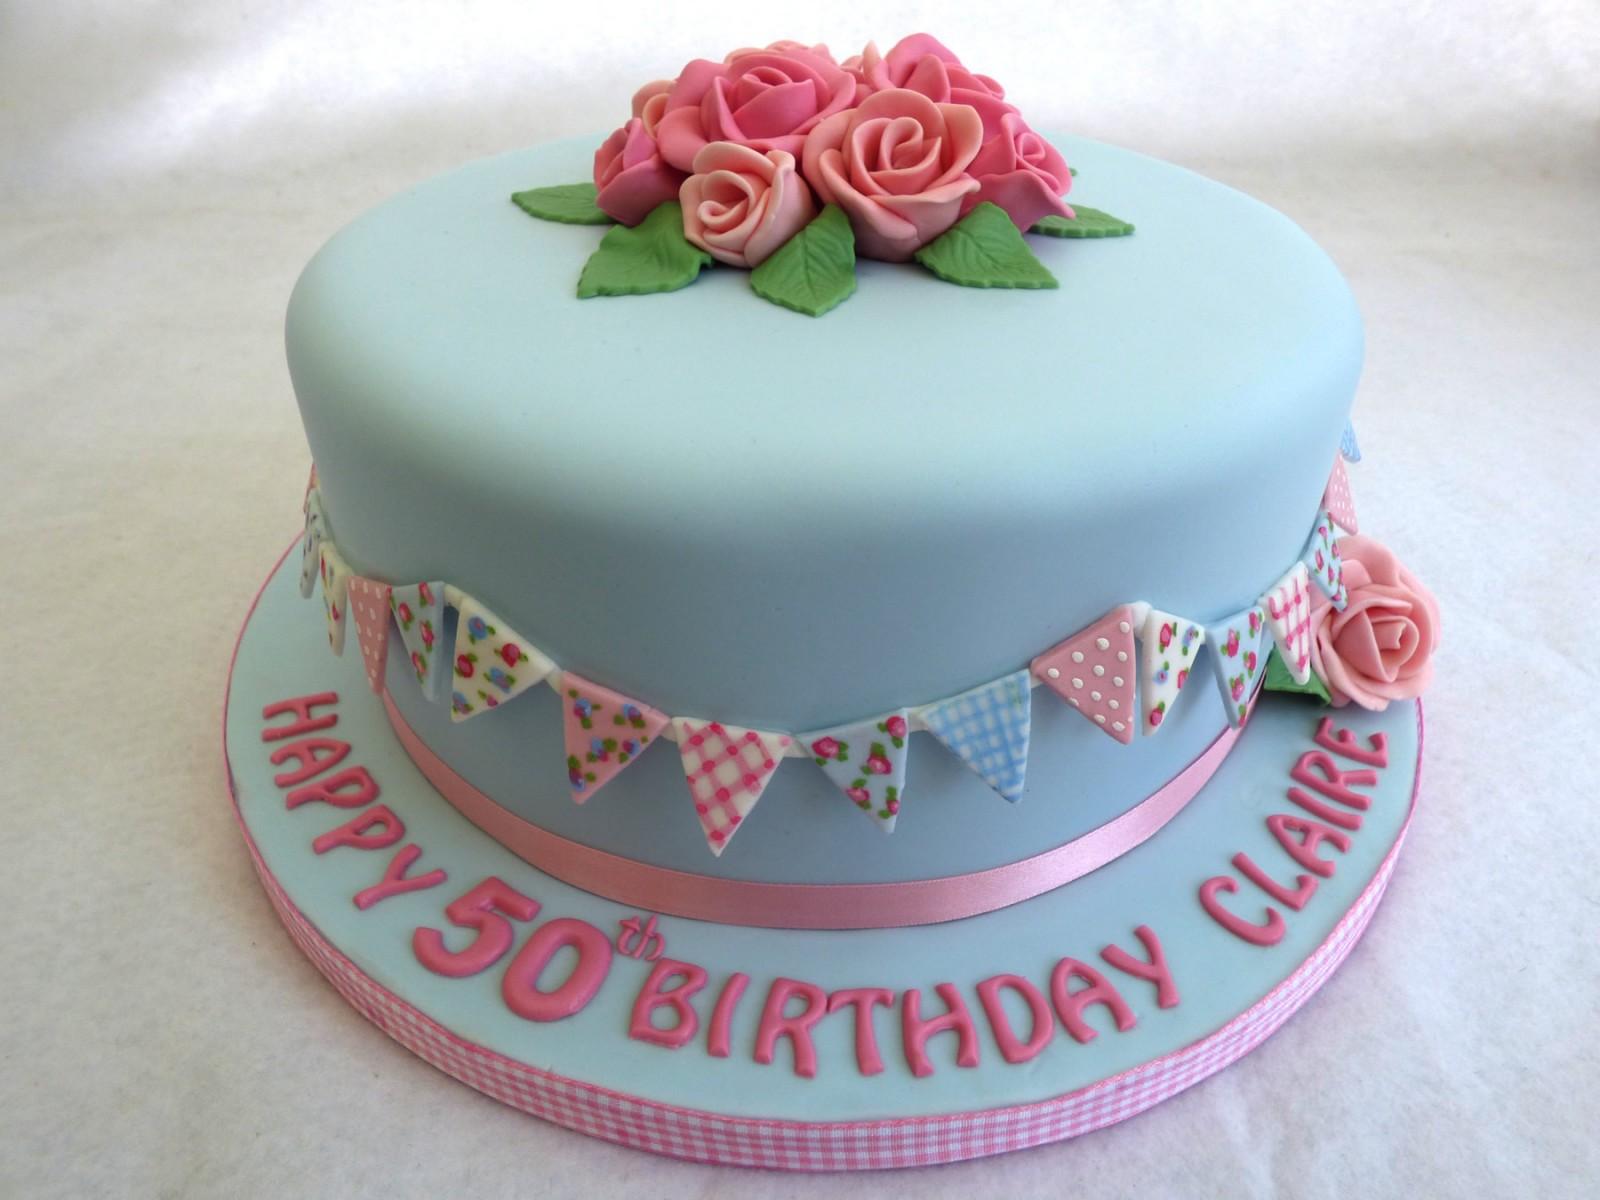 Vintage Birthday Cake Images : Pretty Vintage Style Birthday Cake   Susie s Cakes